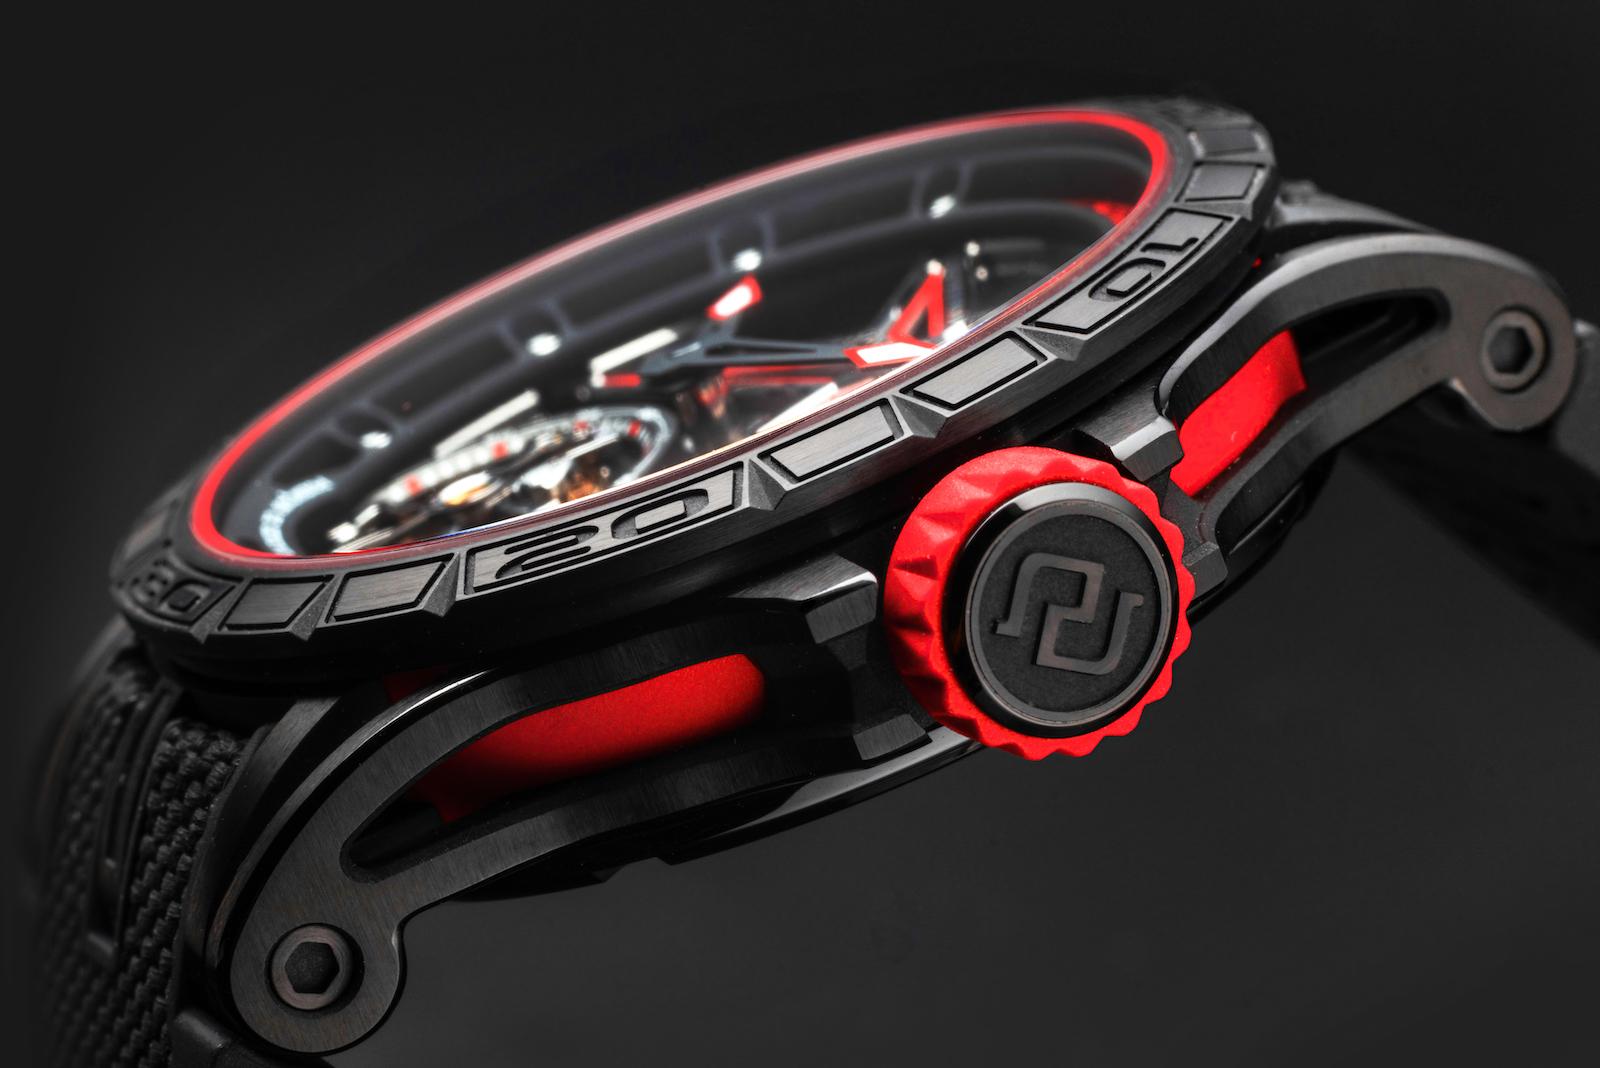 Roger Dubuis Excalibur Spider Flying Tourbillon 39 - Pirelli carrura